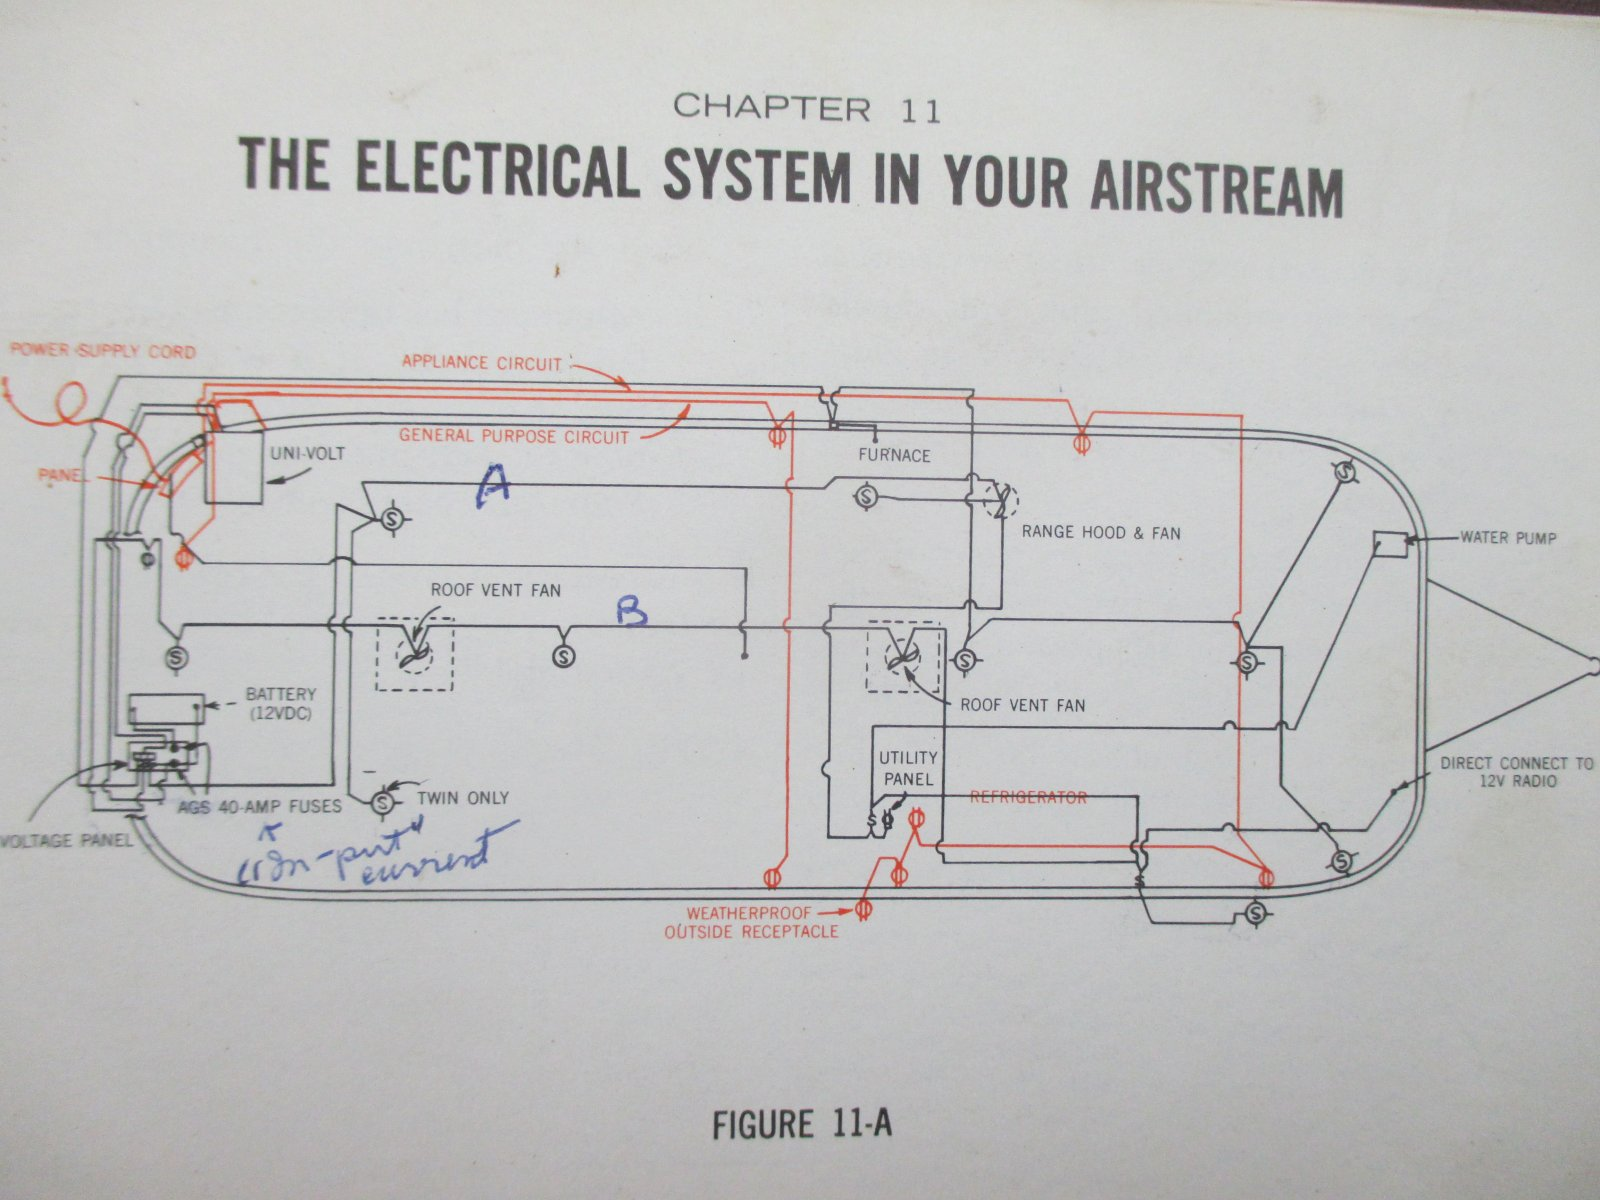 jayco expanda battery wiring diagram wiring schematics and diagrams jayco wiring diagrams electrical